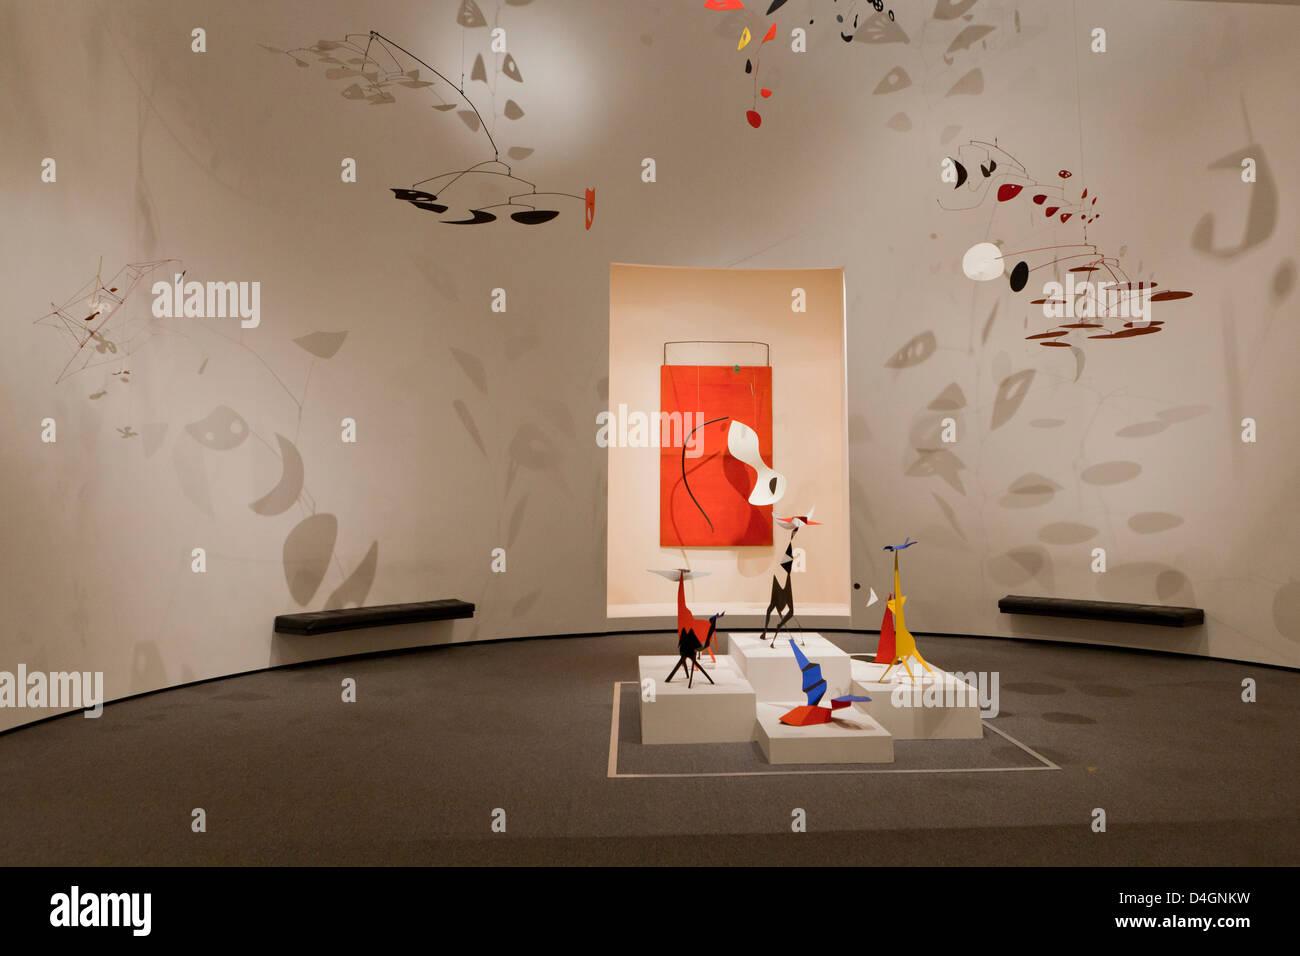 Alexander Calder exhibit at the Smithsonian, National Gallery of Art - Washington, DC USA - Stock Image